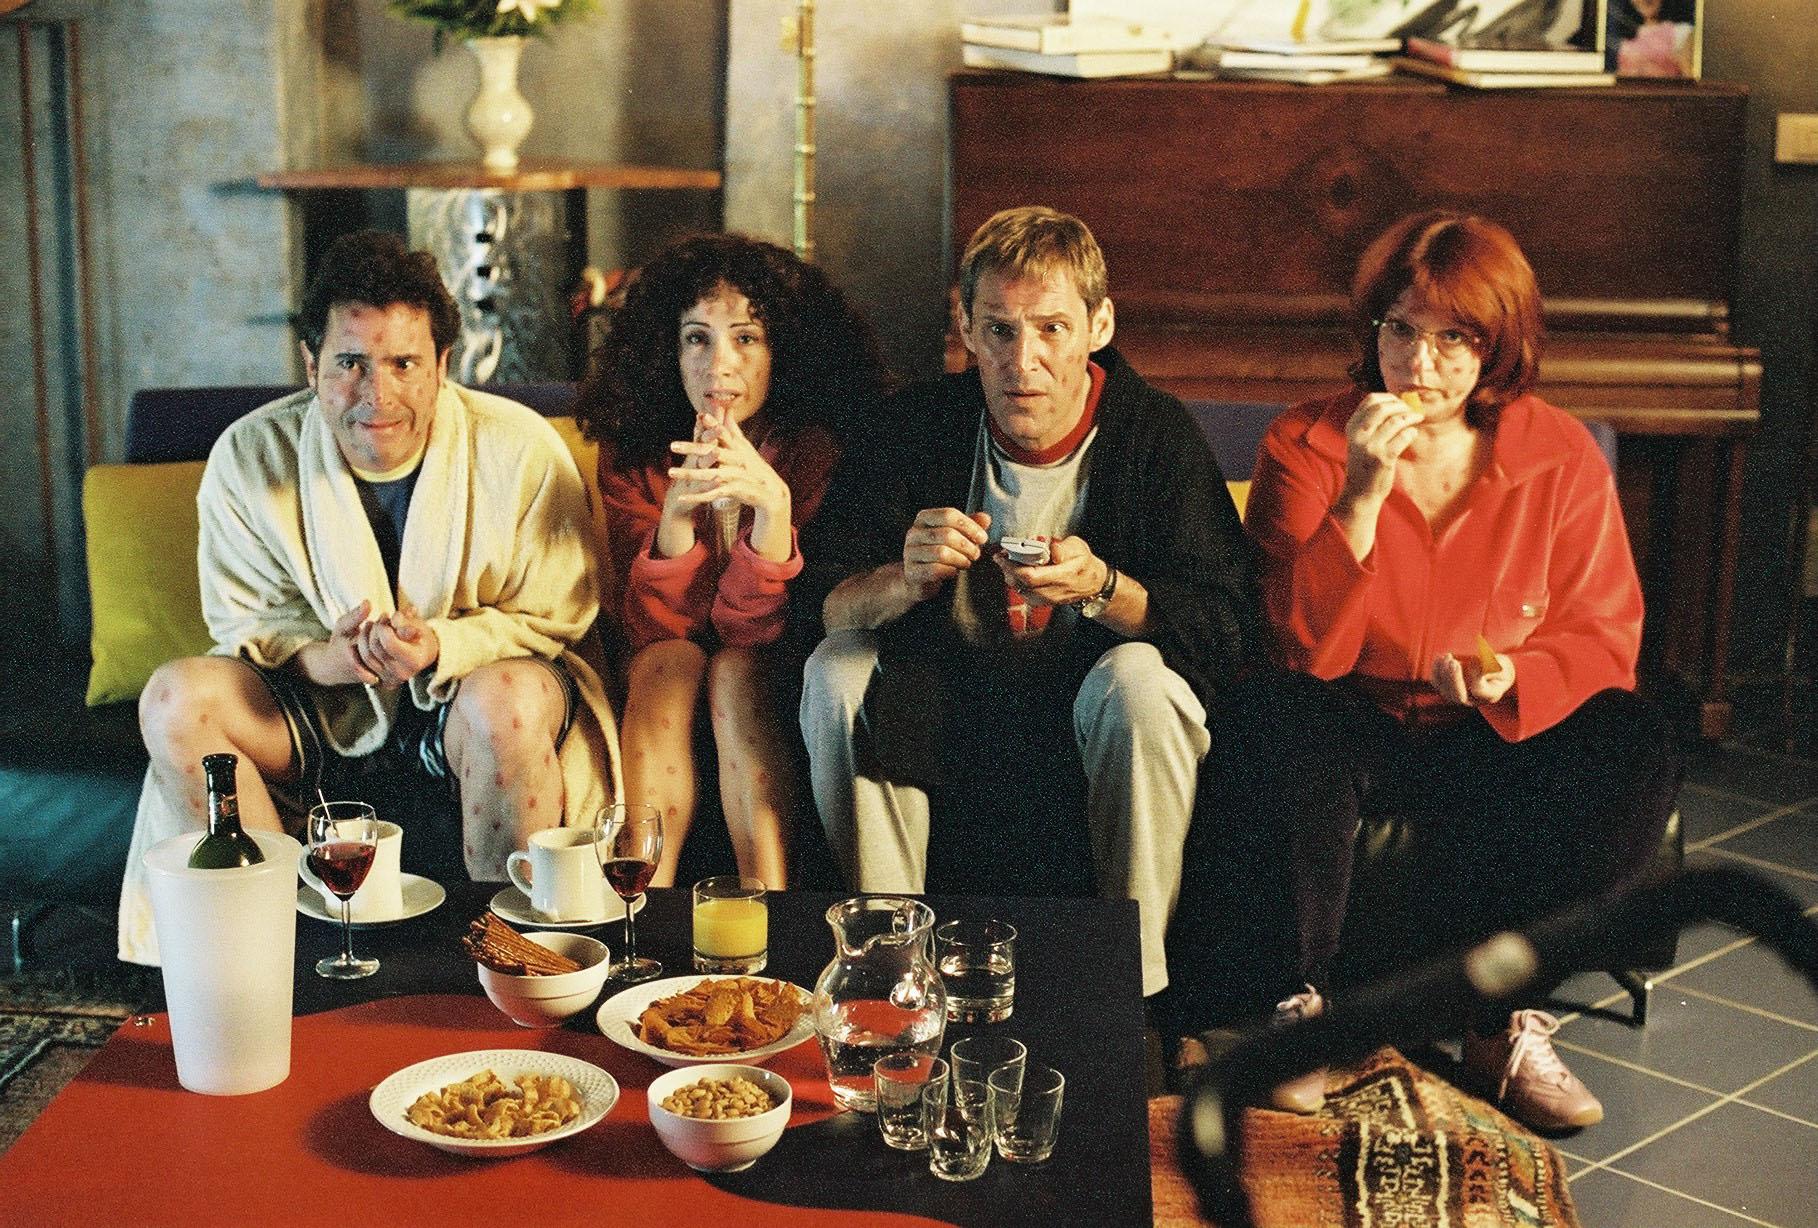 © Star*Film - Nicholas Newman, Sandra Pires, Ben Cross, Elfi Eschke